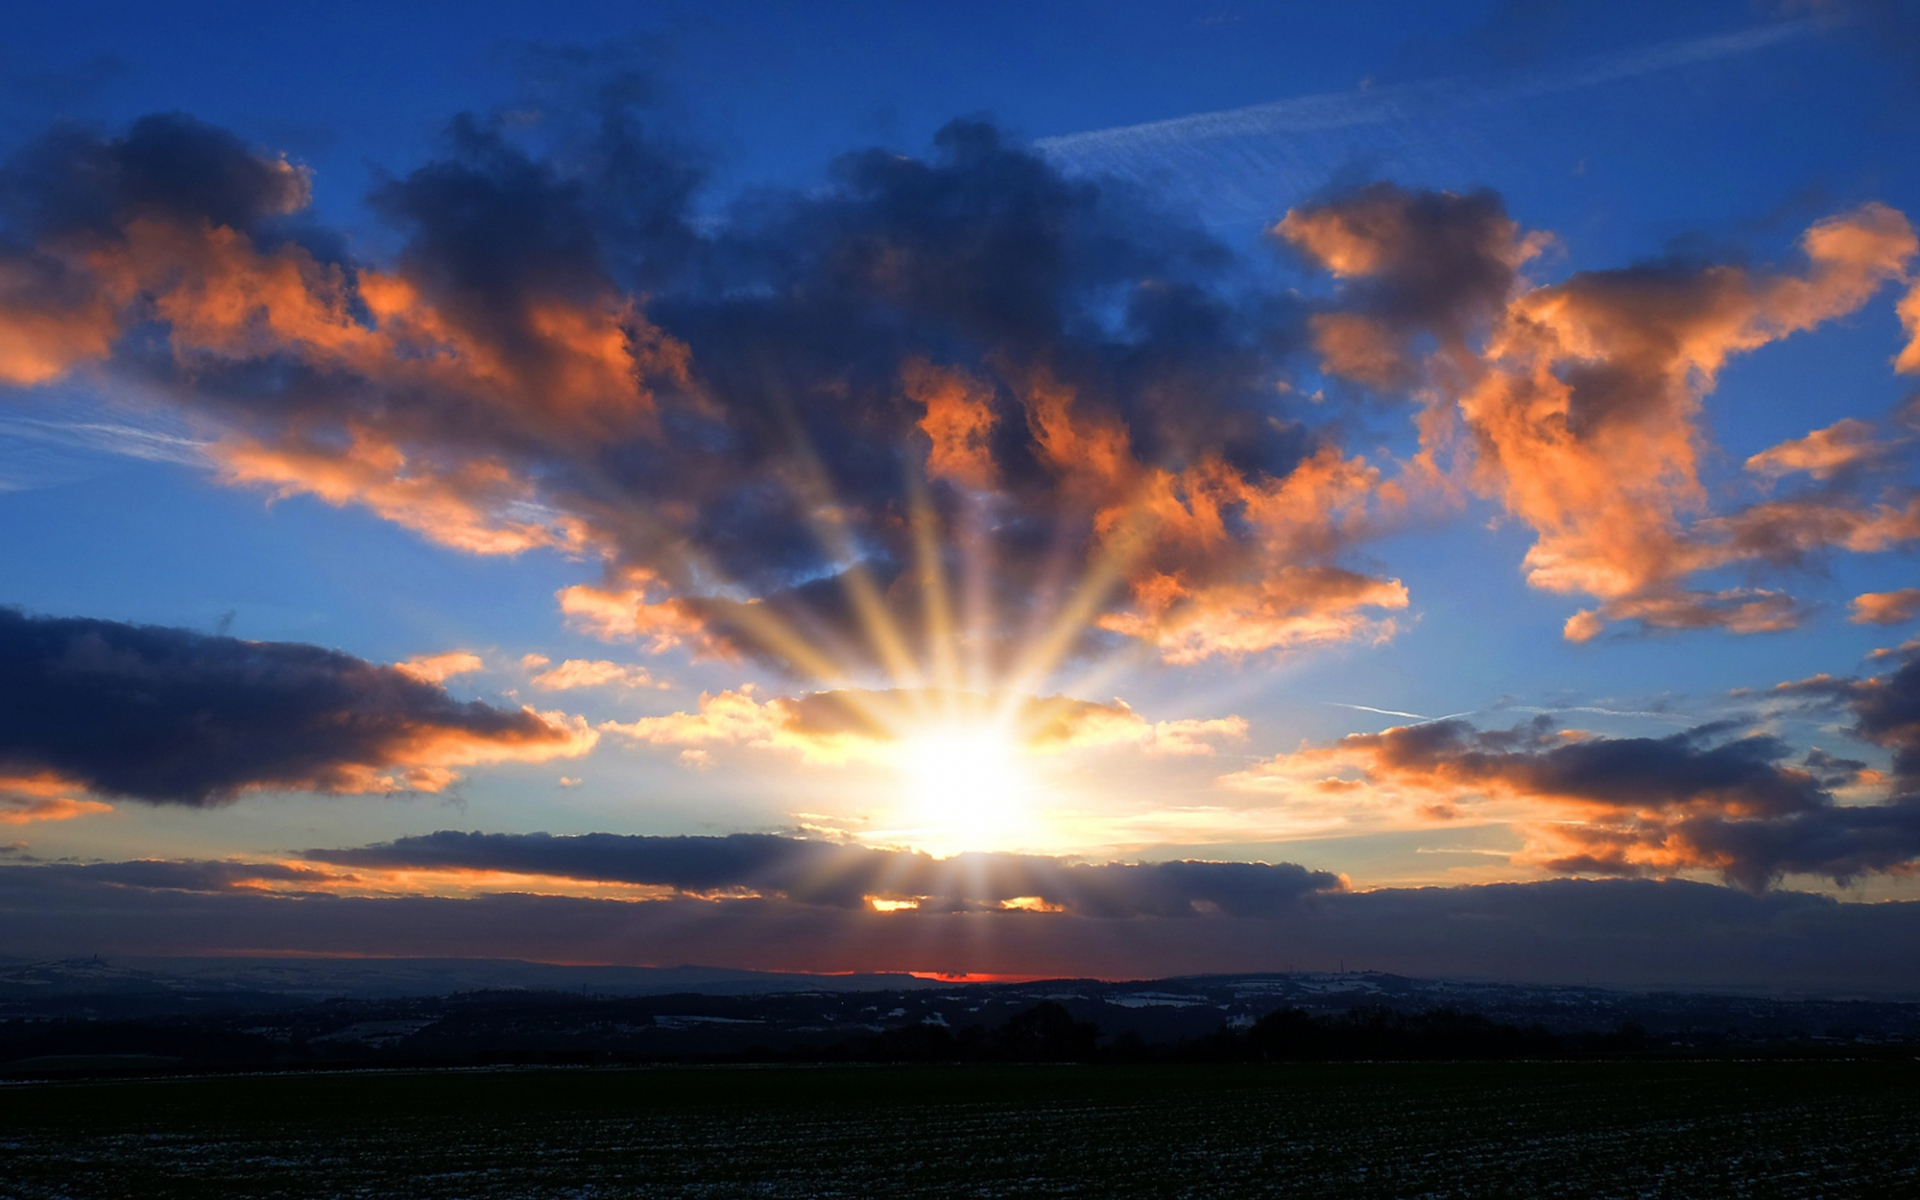 Sunset Sky Wallpaper Background